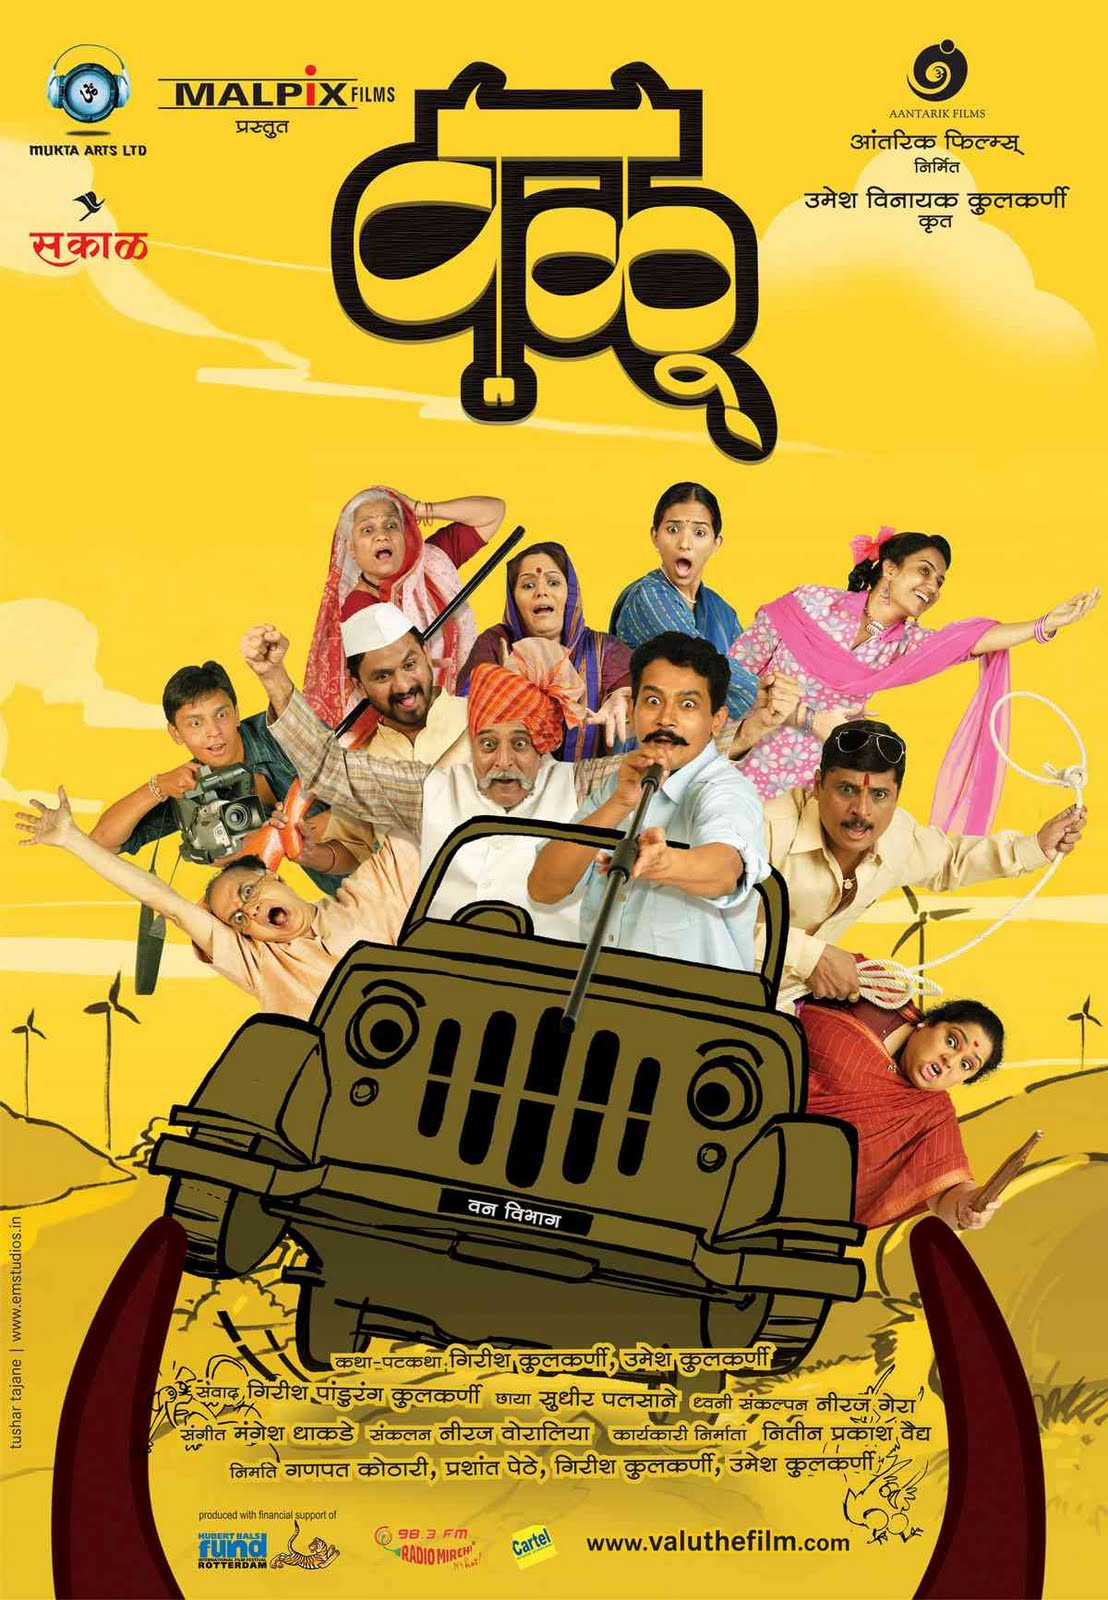 Free Marathi Family Chudai Stories In English Fiftieth